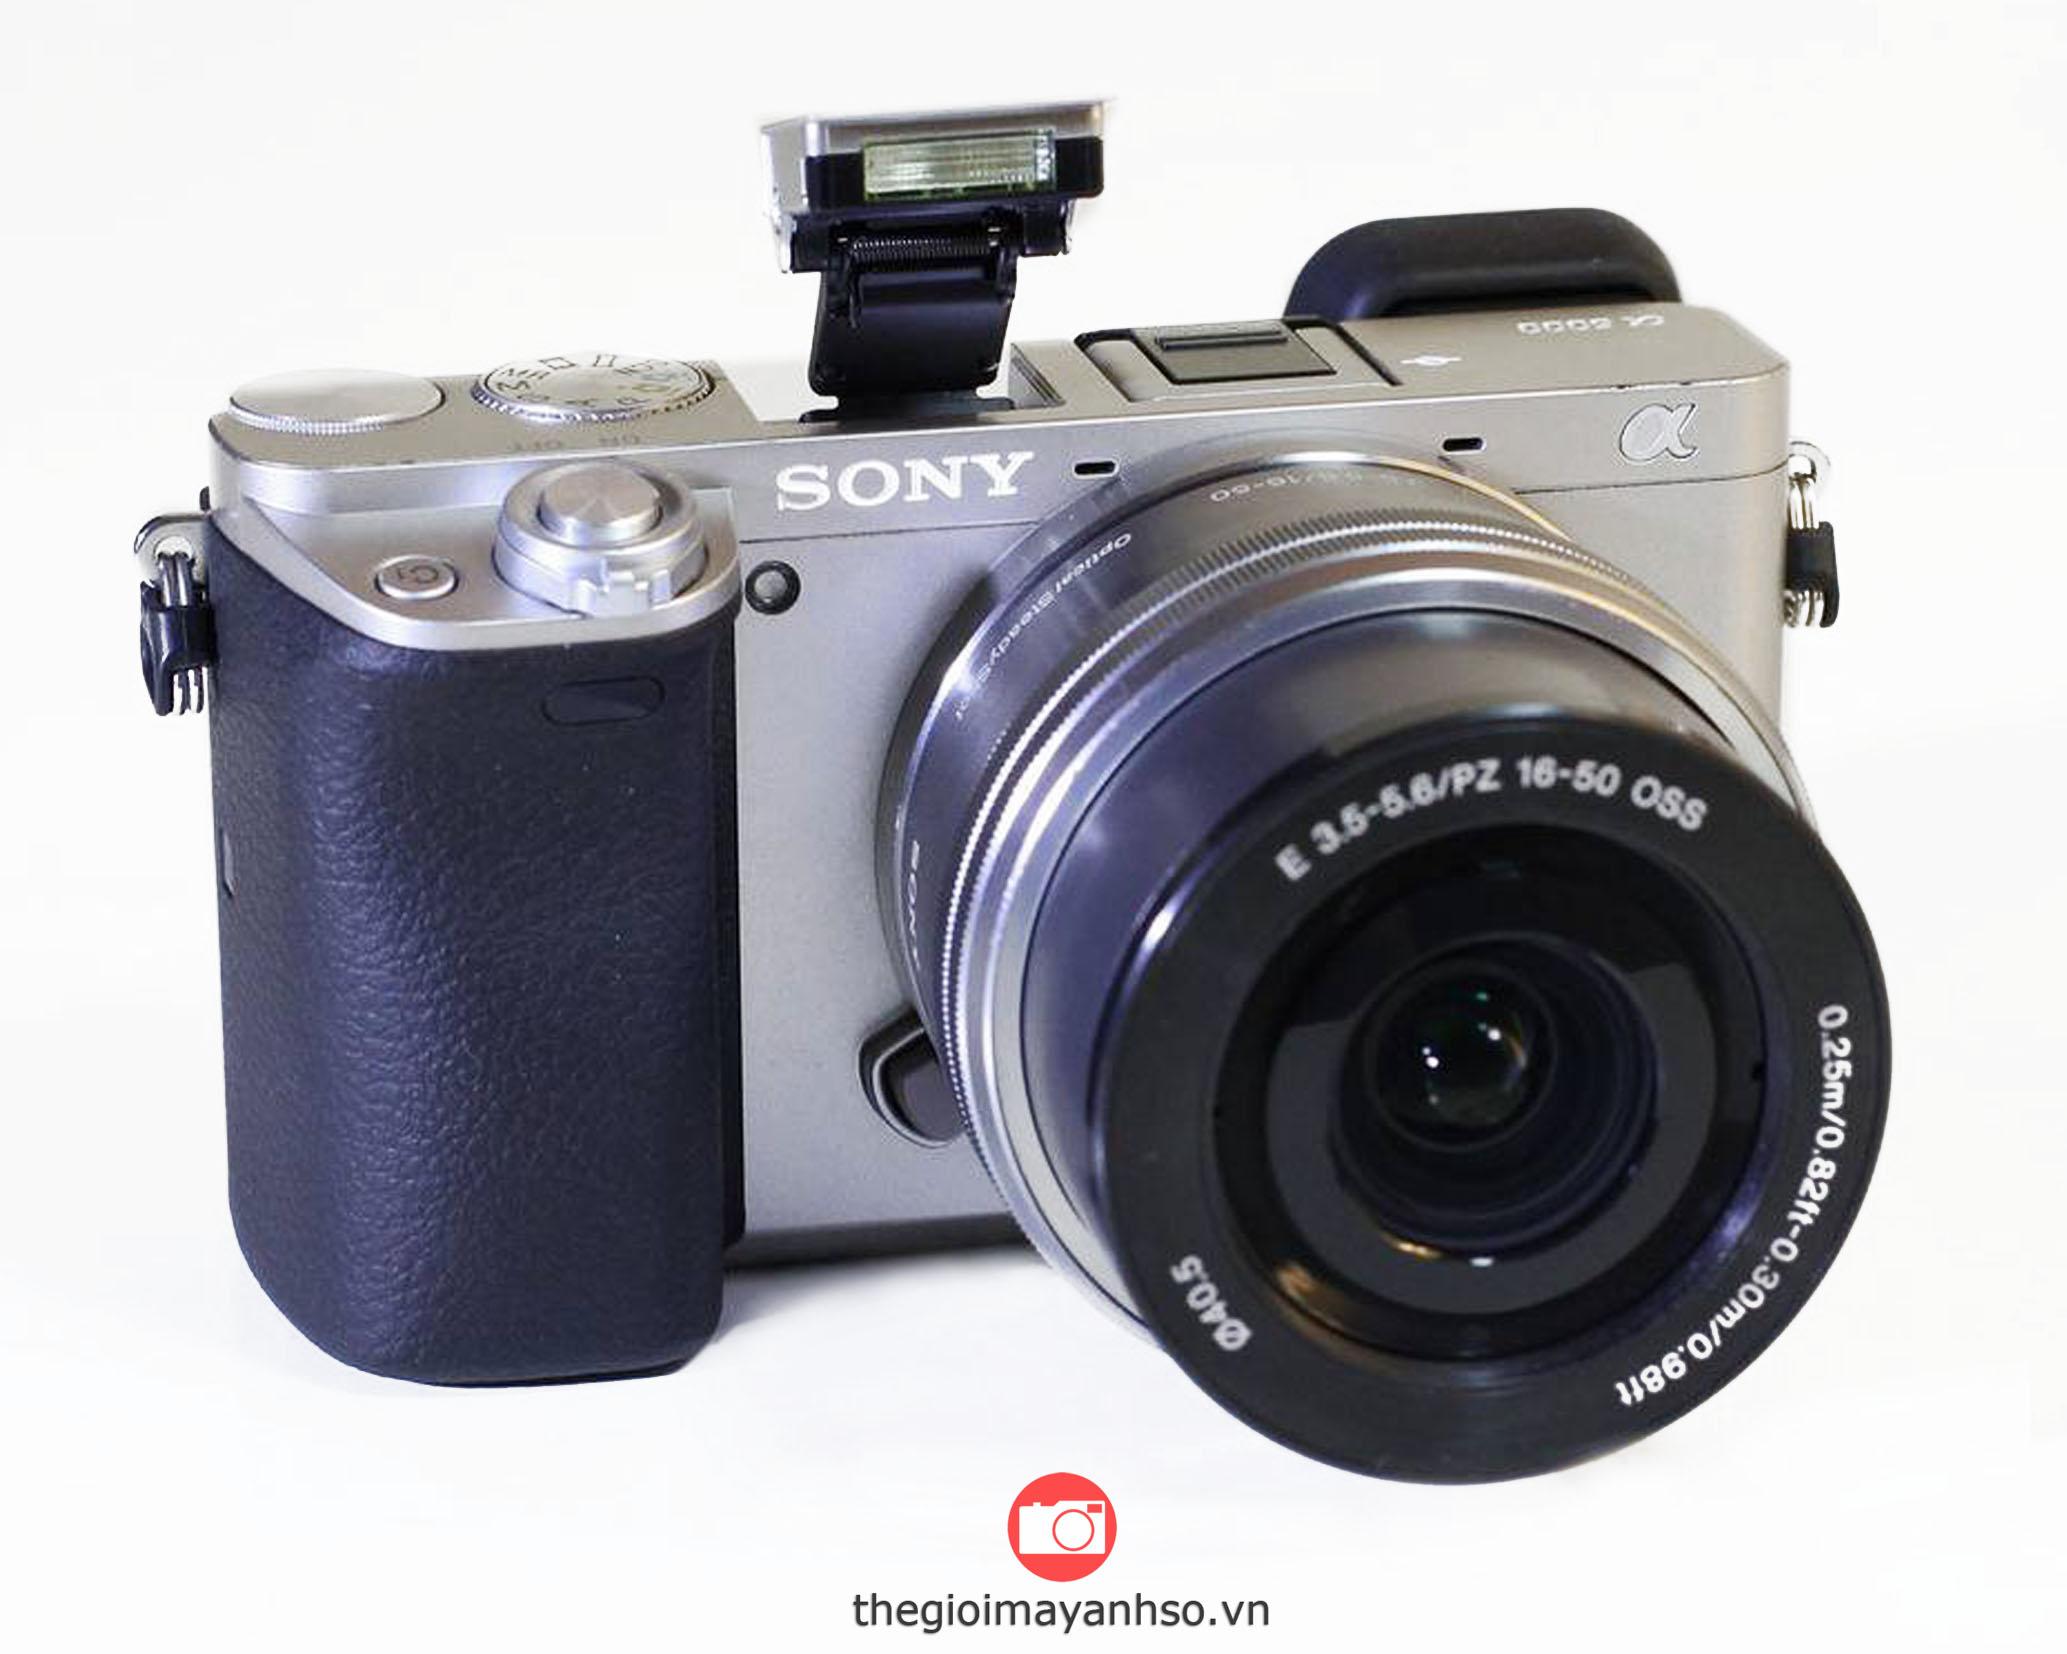 Sony A6000 kit 16-50mm OSS